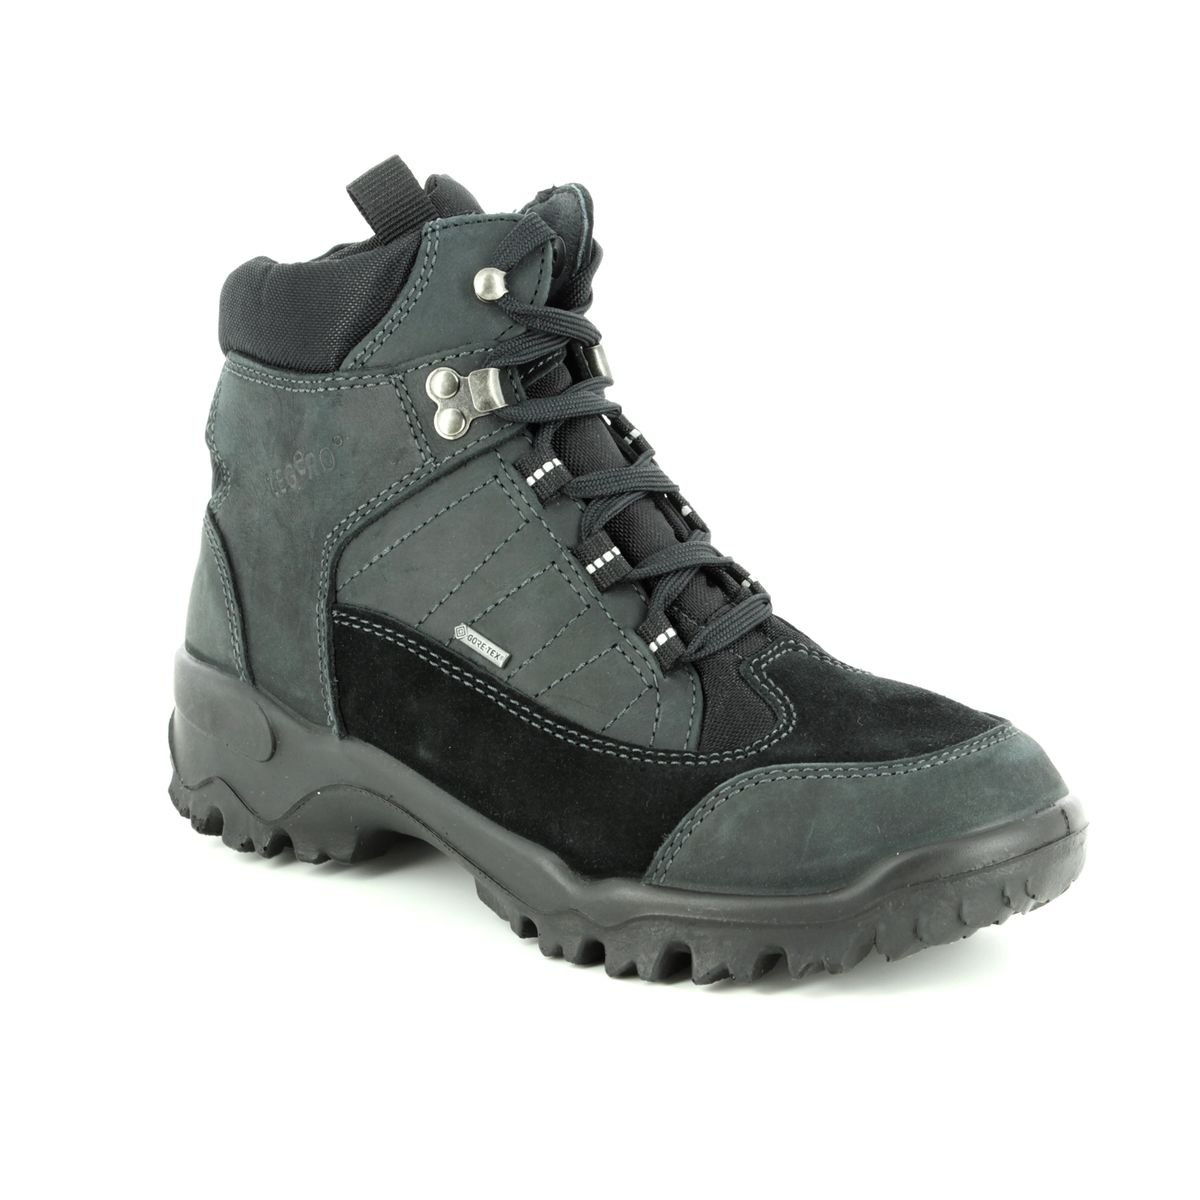 3eabed418d0 Gore Tex. Legero Walking Boots - Black nubuck - 00502/00 WALK GTX LADIE